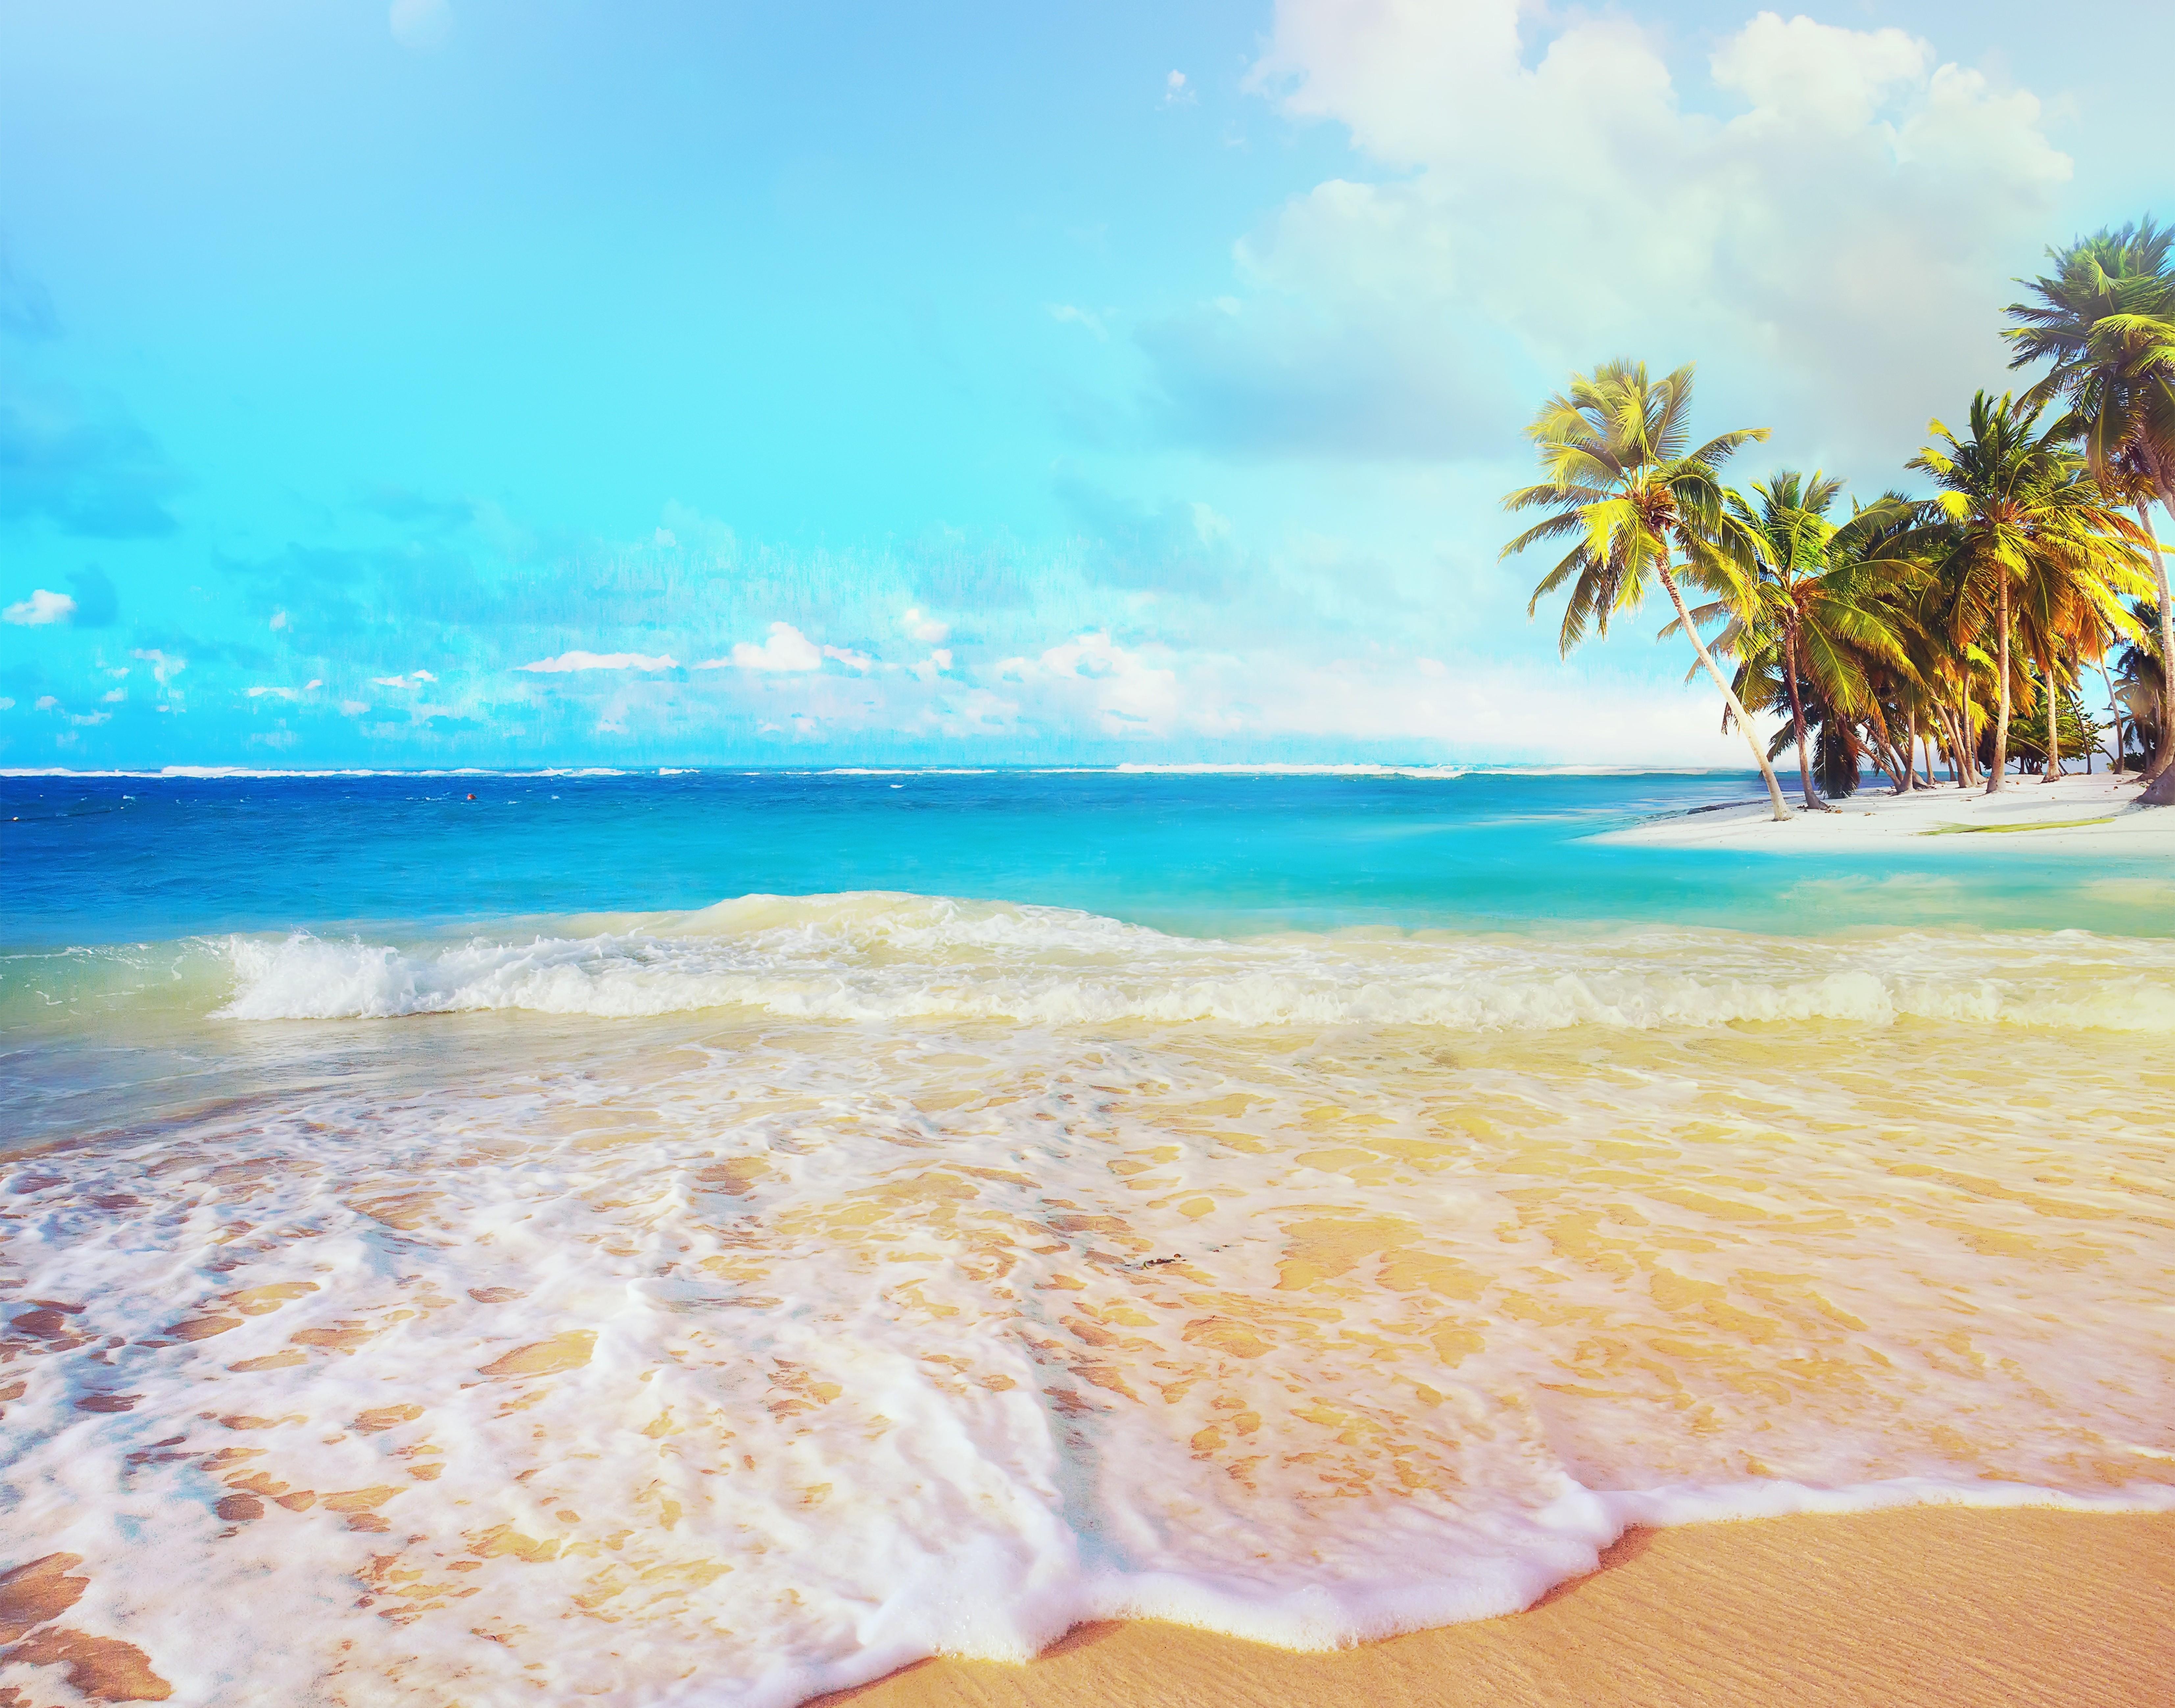 General 6614x5195 landscape beach tropical sea sea foam palm trees